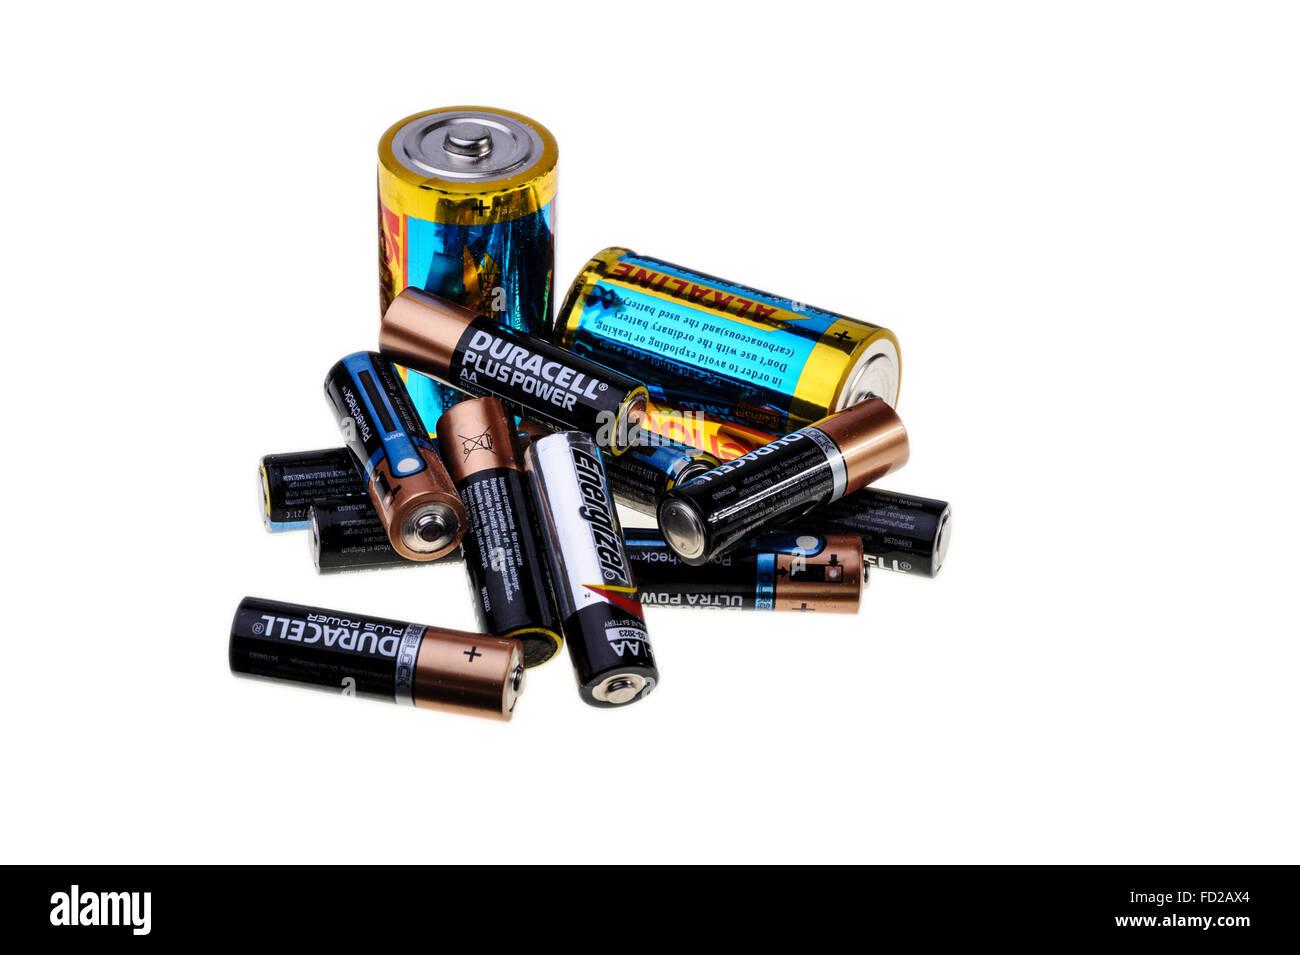 Old used alkaline batteries. - Stock Image